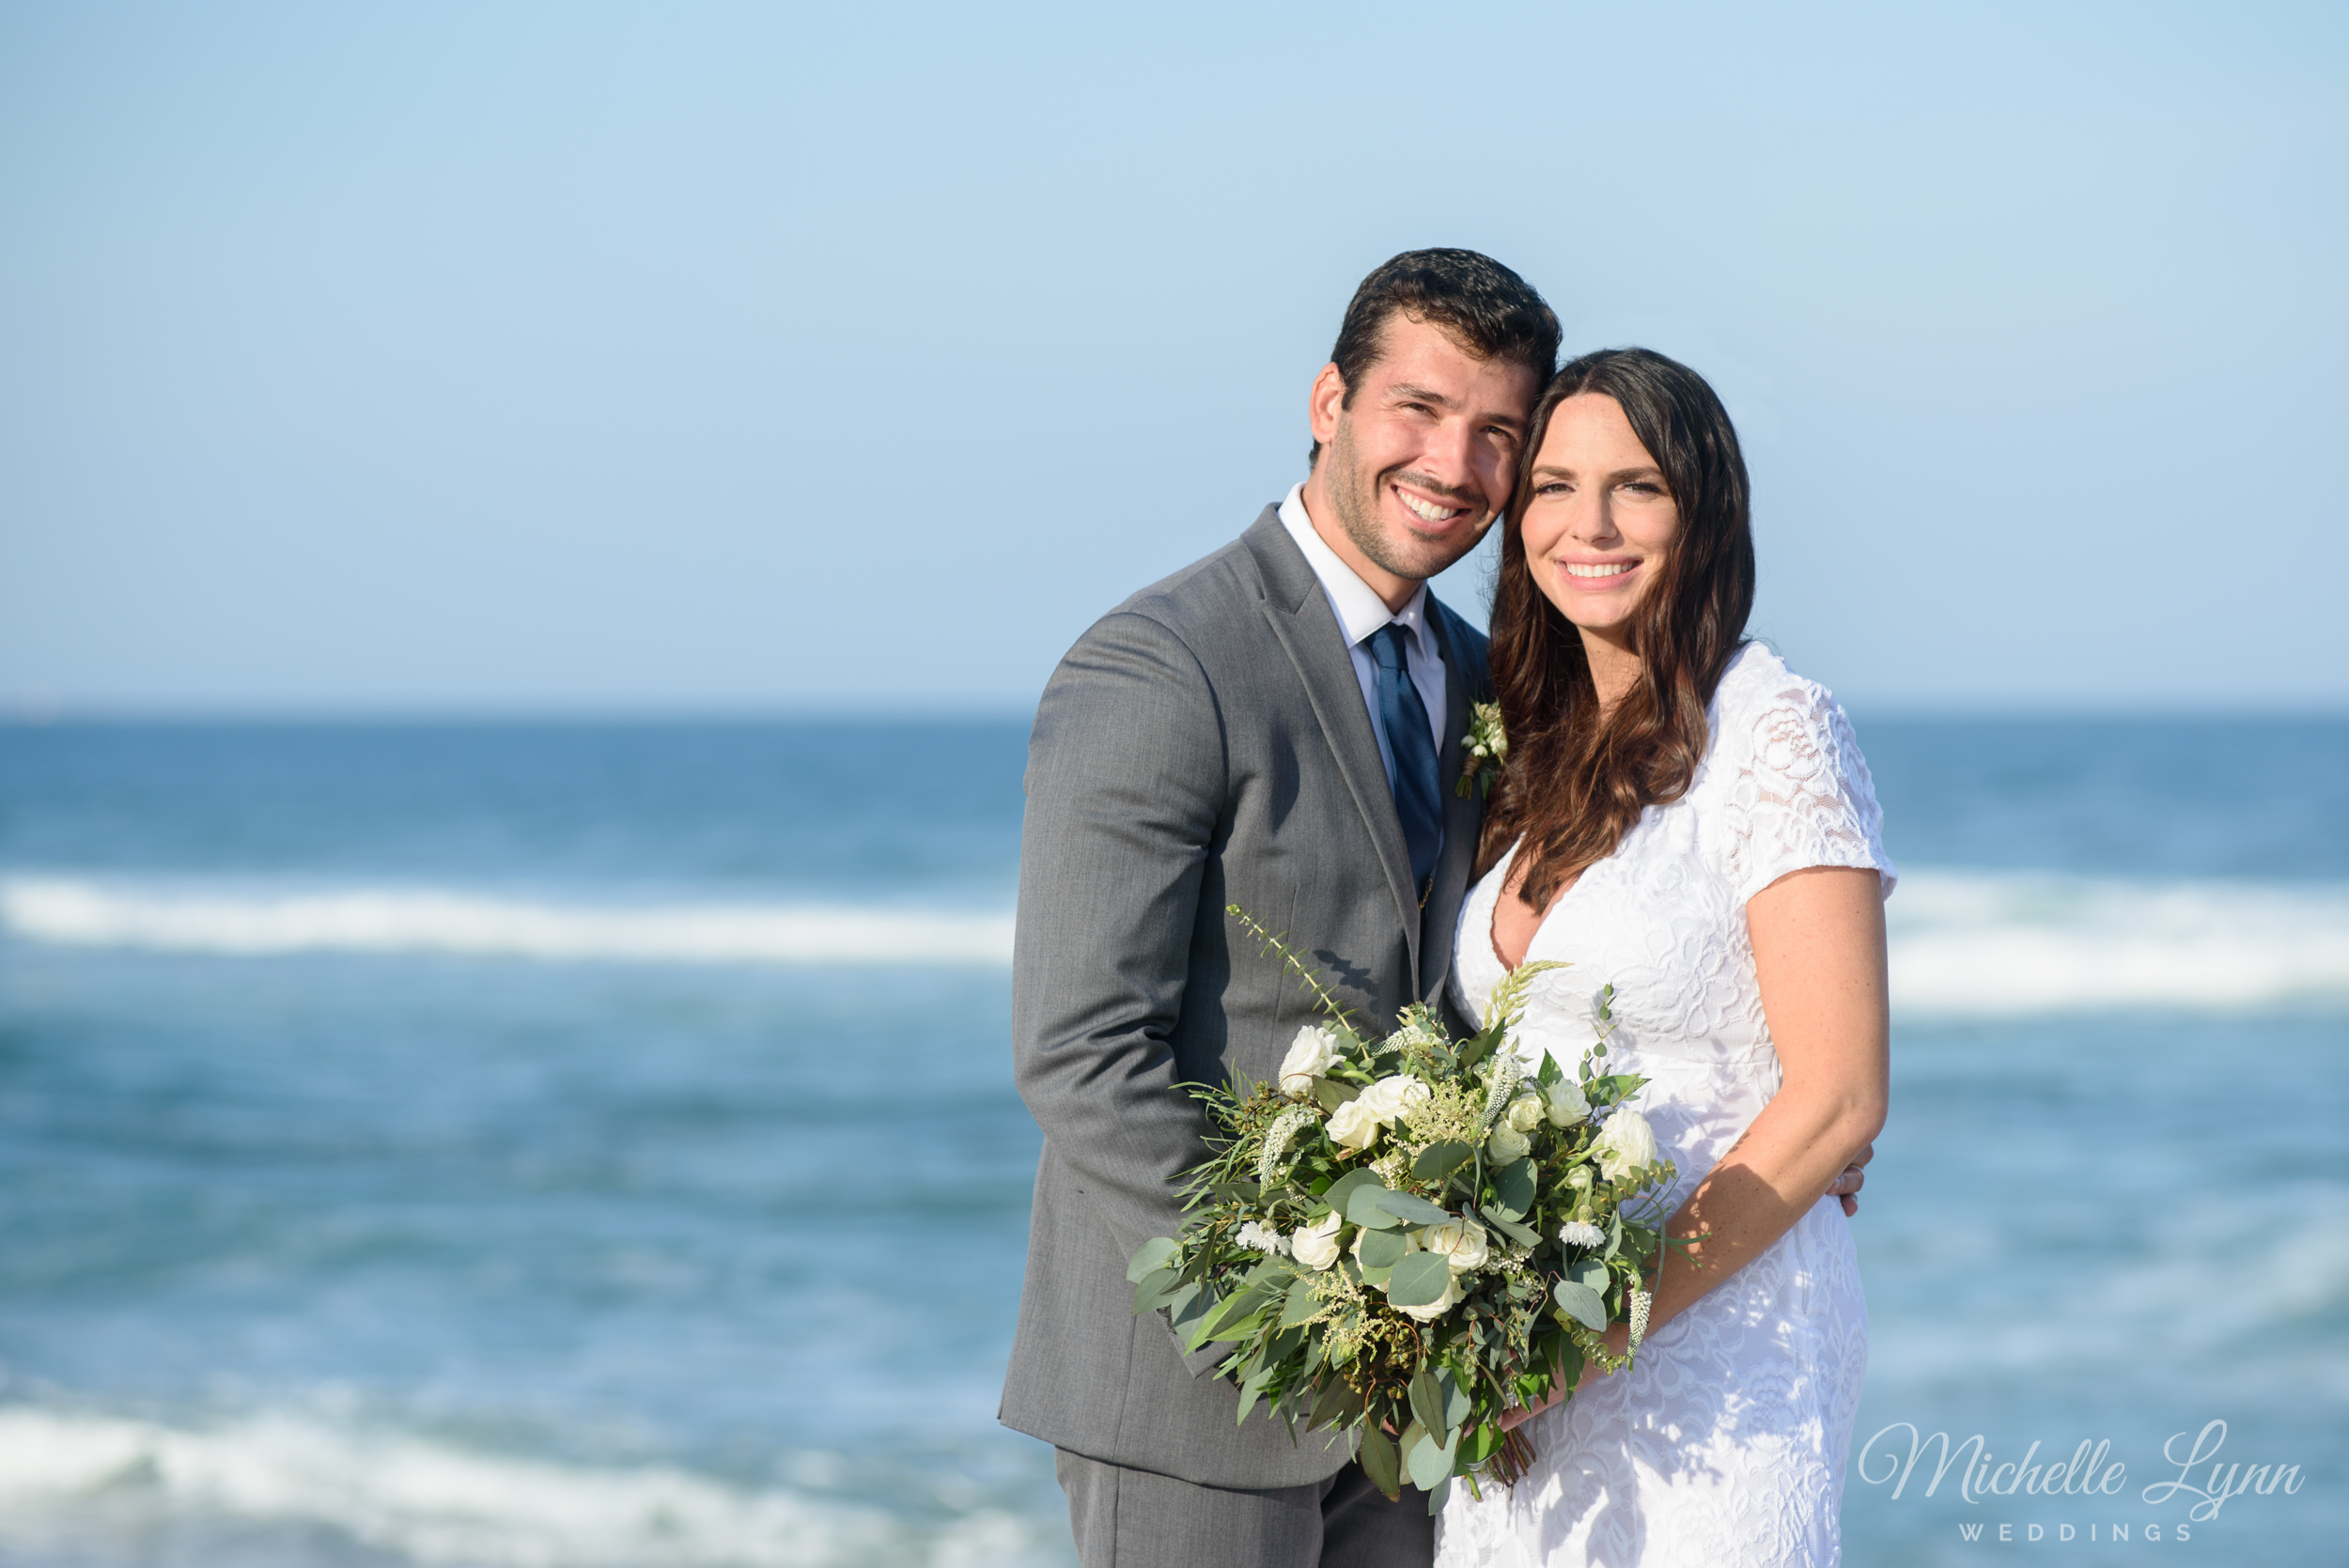 mlw-long-beach-island-new-jersey-wedding-photography-5.jpg